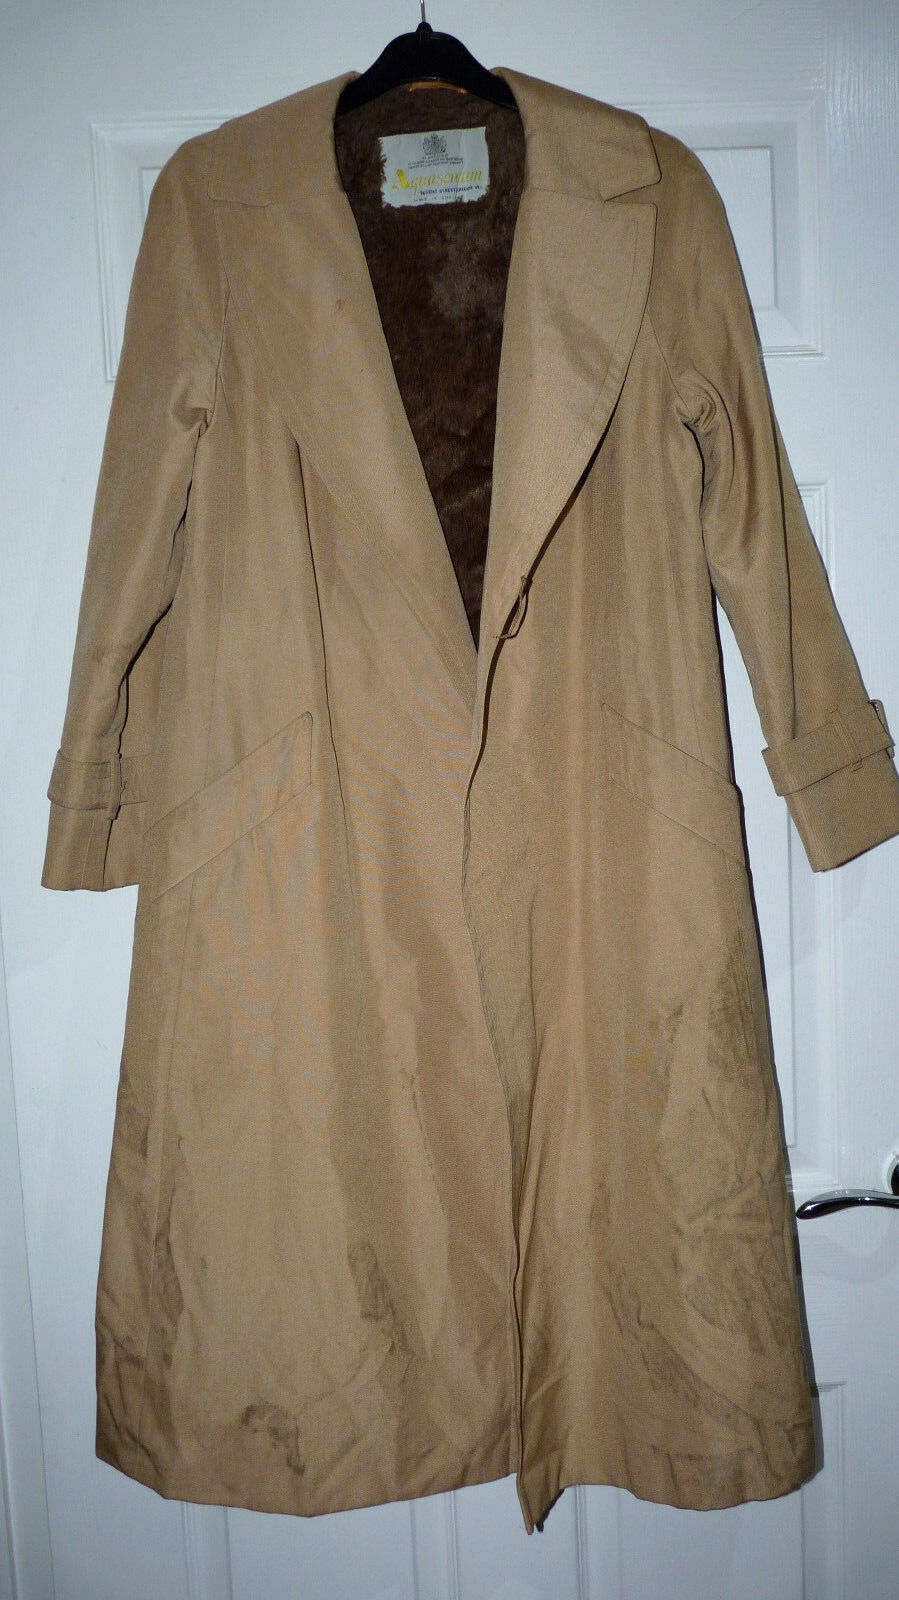 Vintage Aquascutum Aqua5 Beige Trench Coat with Acrilyc lining size 10